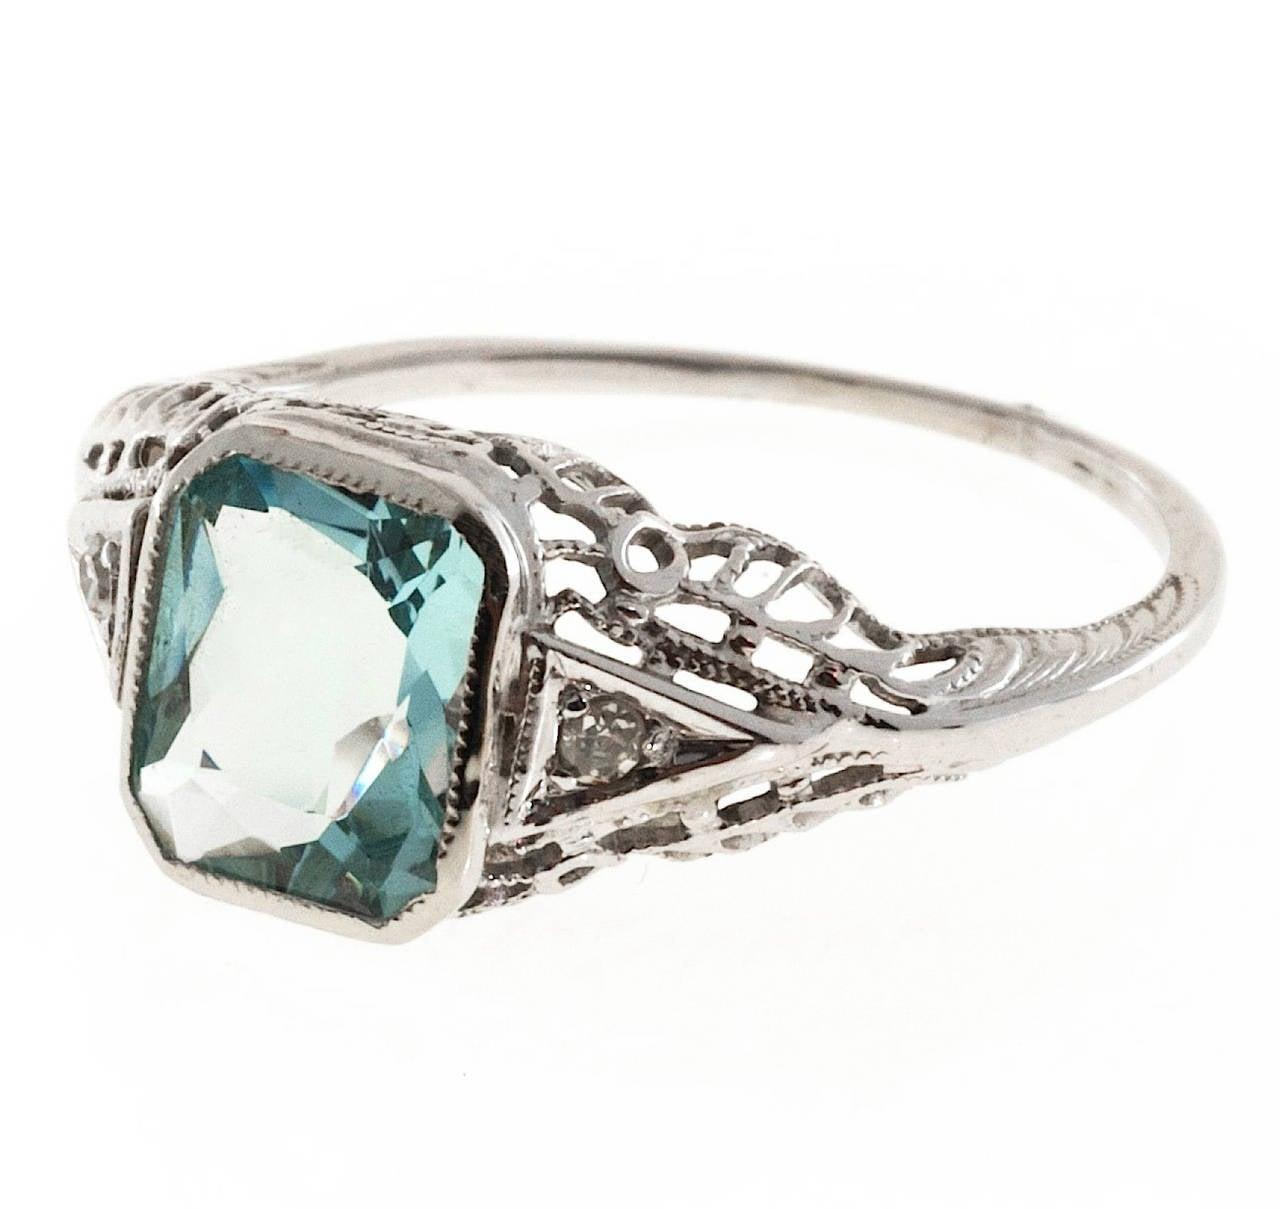 Art Deco filigree ring  cut natural untreated Aqua. Circa 1930 to 1940.  1 Natural no heat untreated Aqua, approx. total weight 1.58cts, 8 x 6.5mm 2 single cut diamonds, approx. total weight .02cts, I, VS2 14k White Gold 2.0 grams Width at